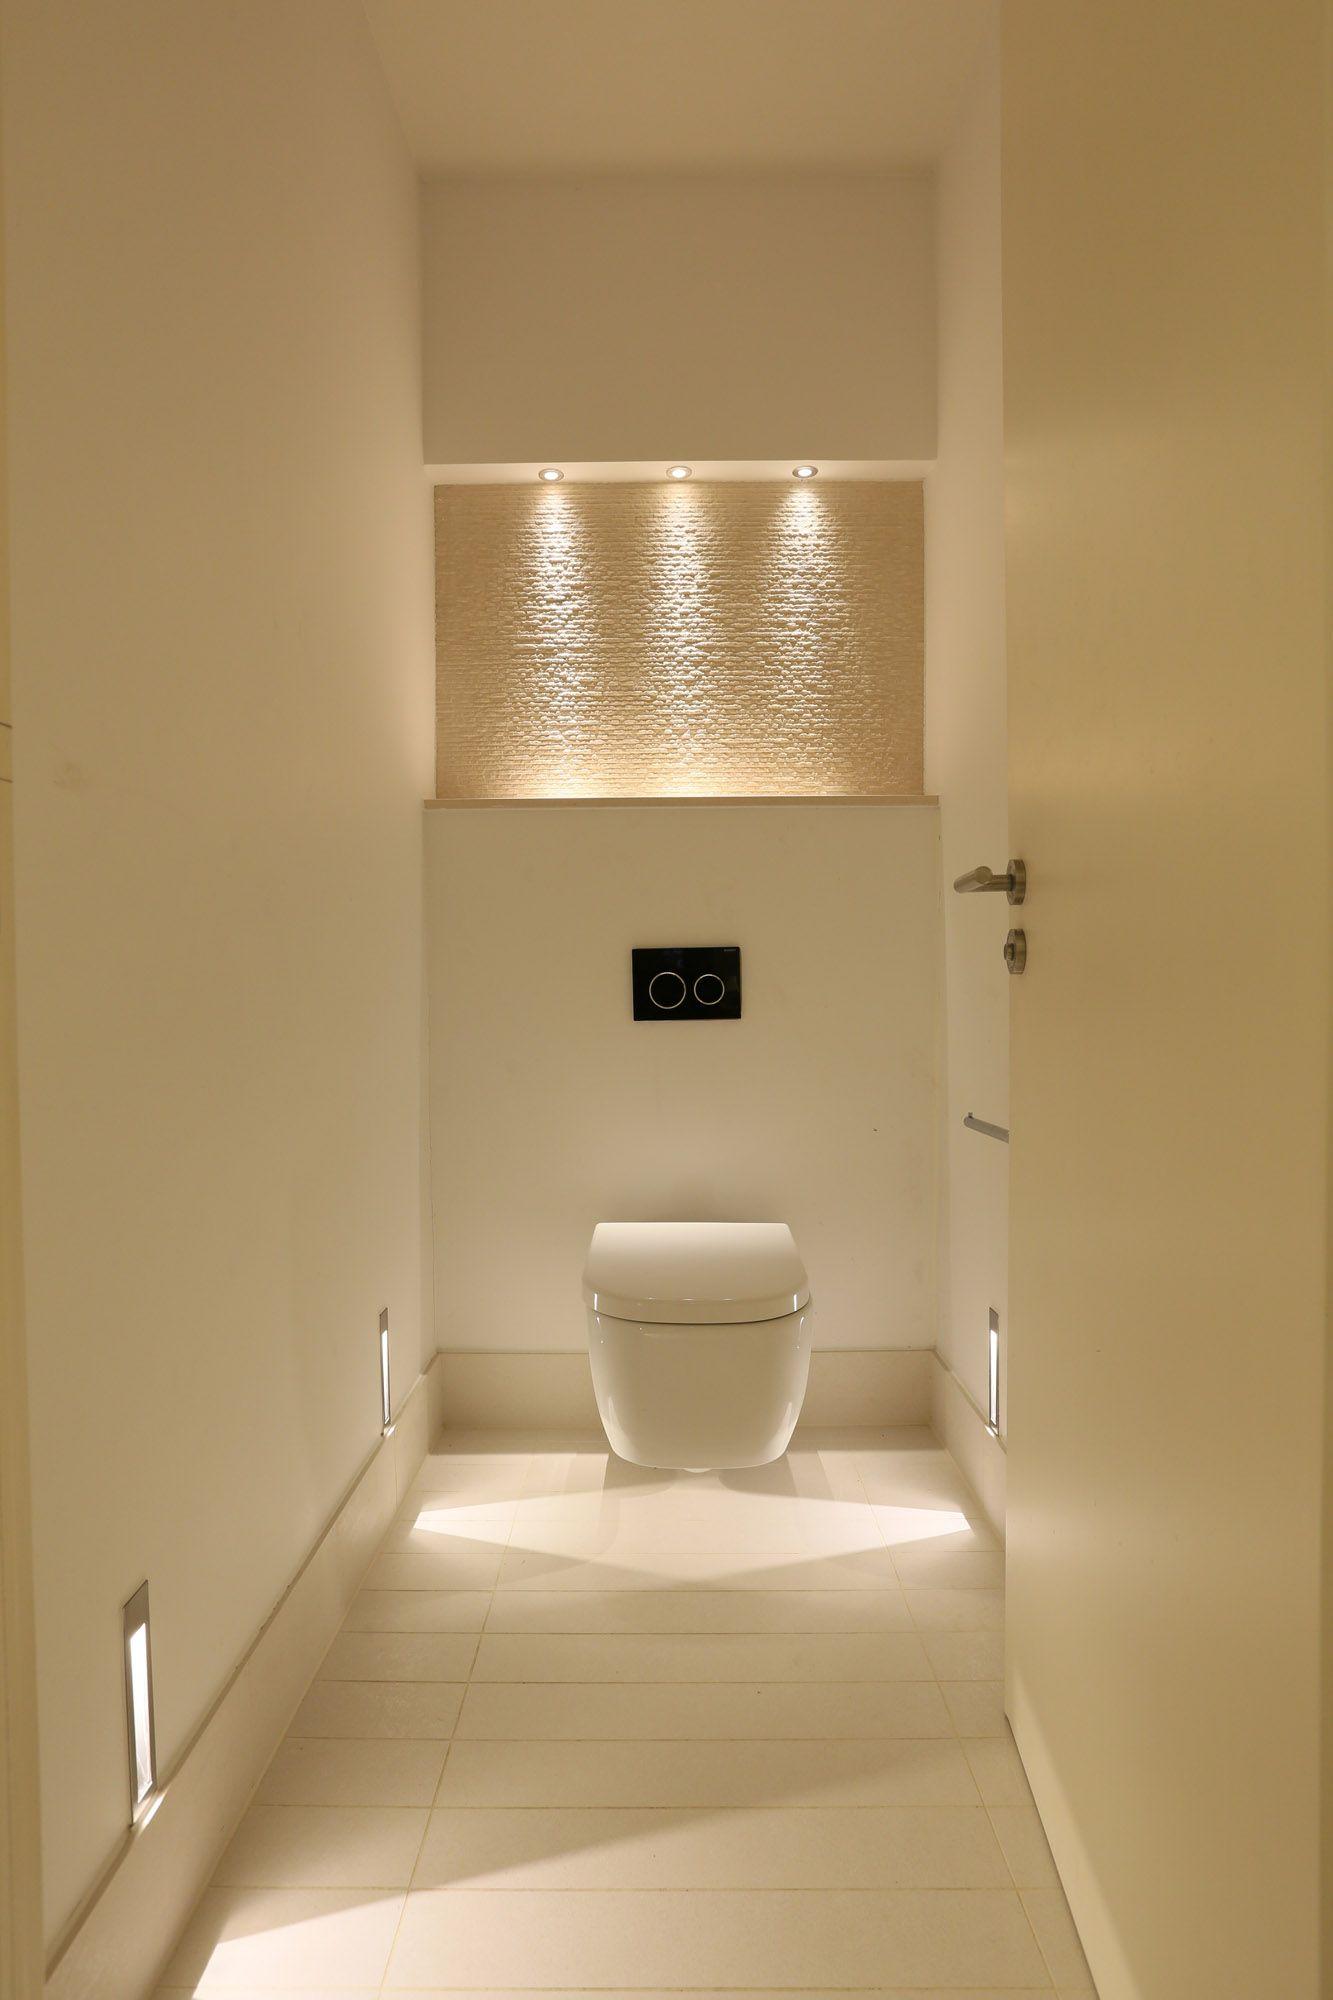 POWDER ROOM Bathroom Lighting Ideas Bathrooms Pinterest